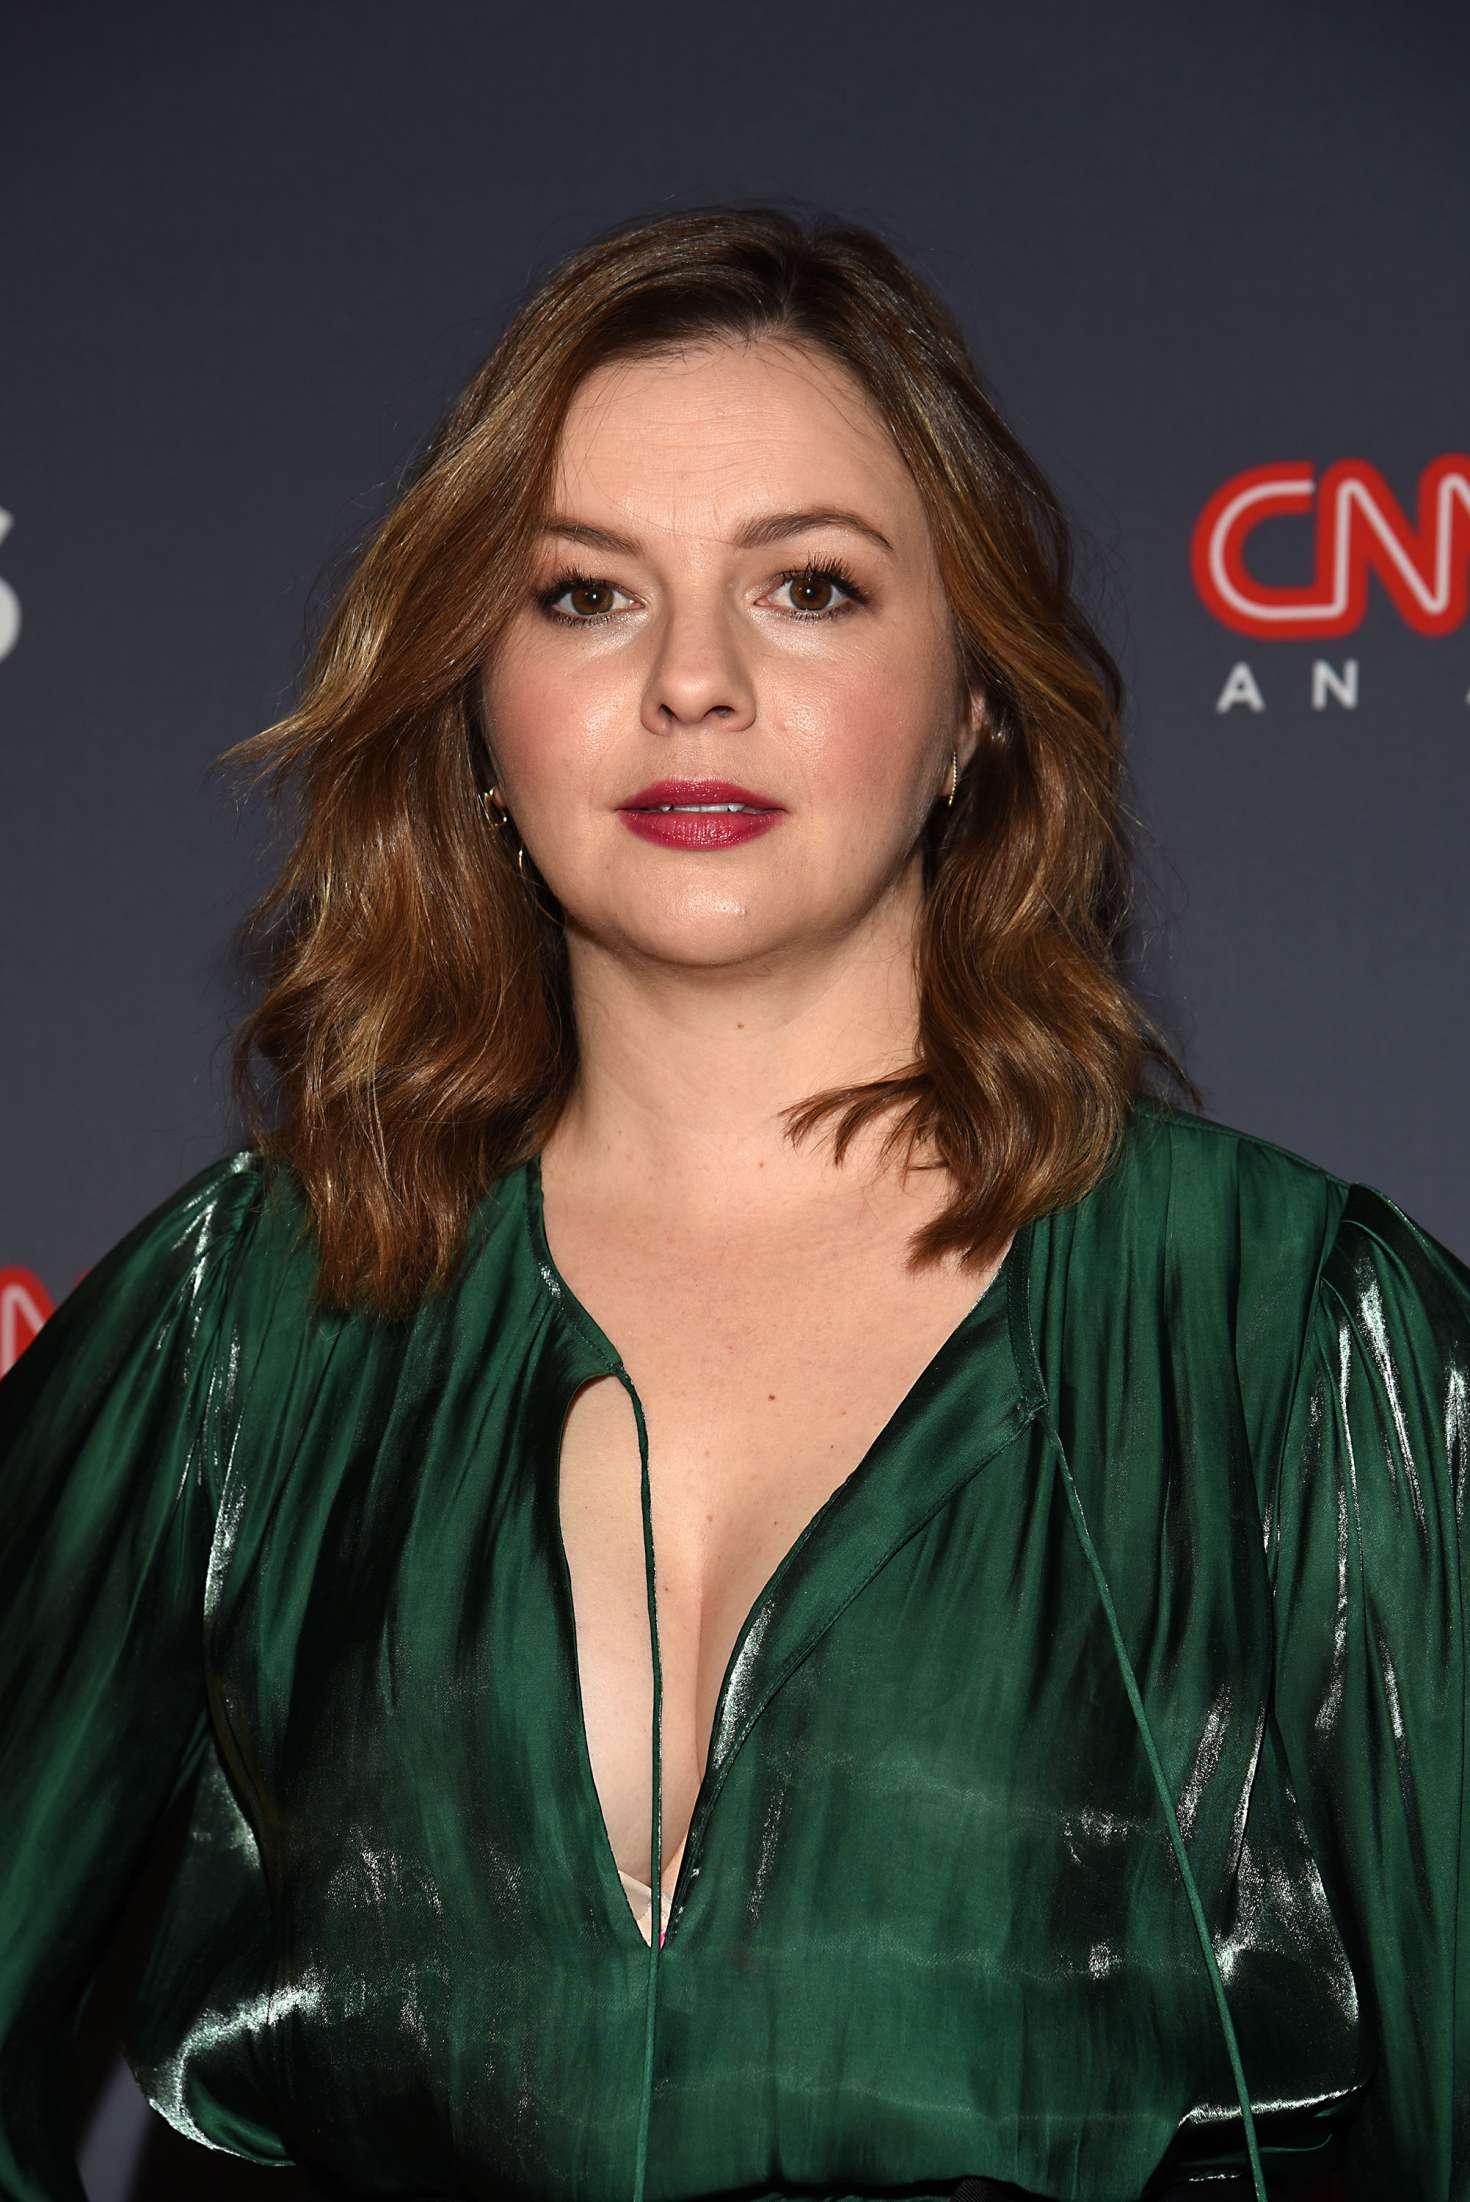 Amber Tamblyn - 2017 CNN Heroes gala in New York